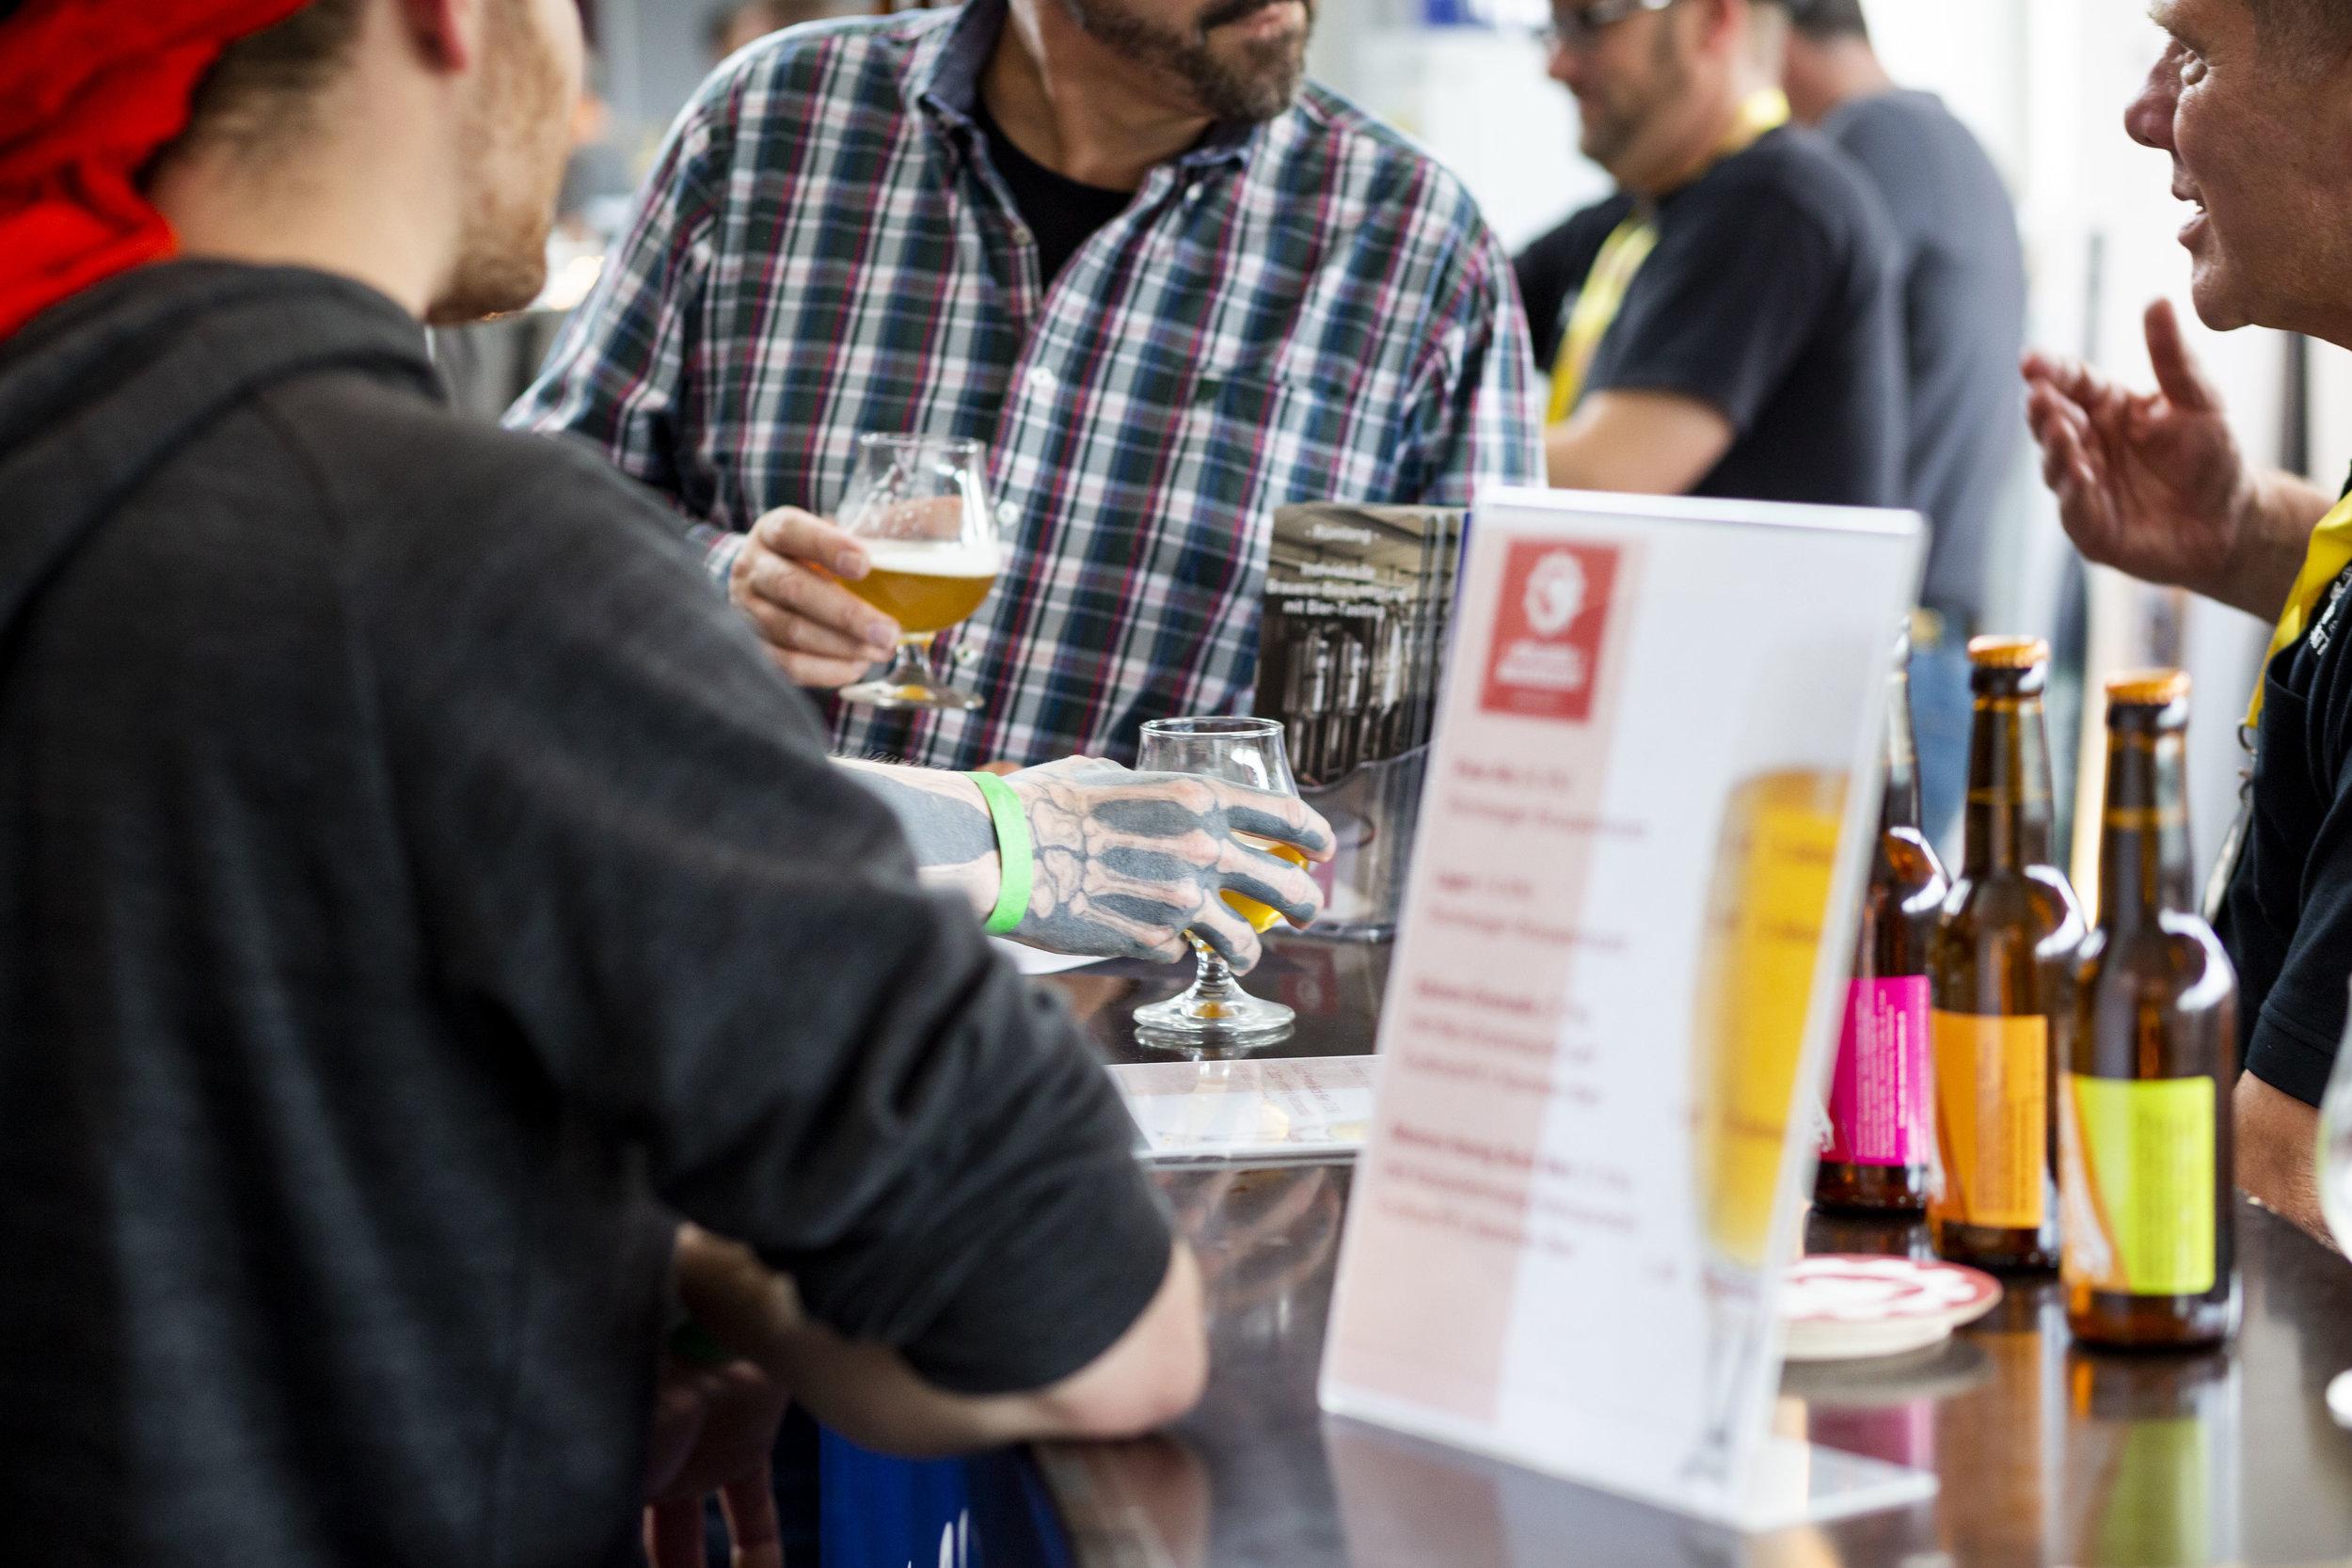 BierfestivalLuzern-15.jpg